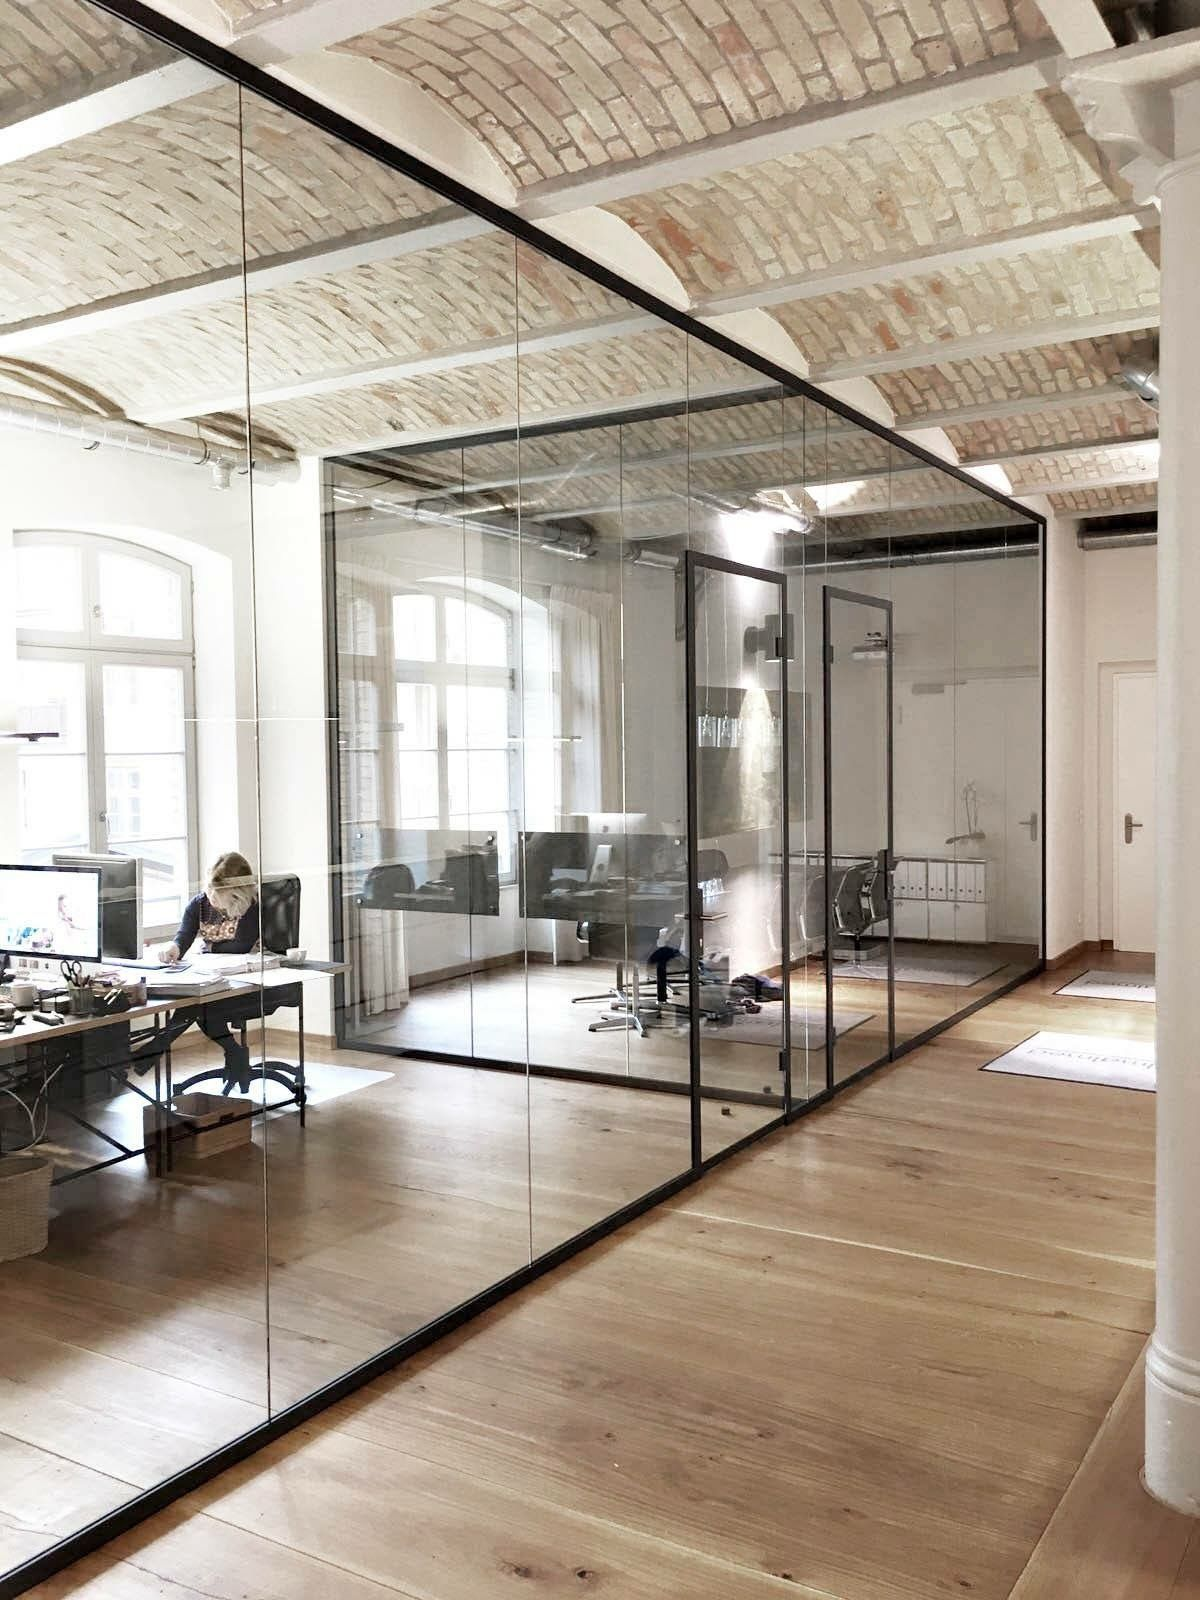 Lichtgrijs omhoog en tekenbedrijf new office pinterest interiors industrial and modern design also rh